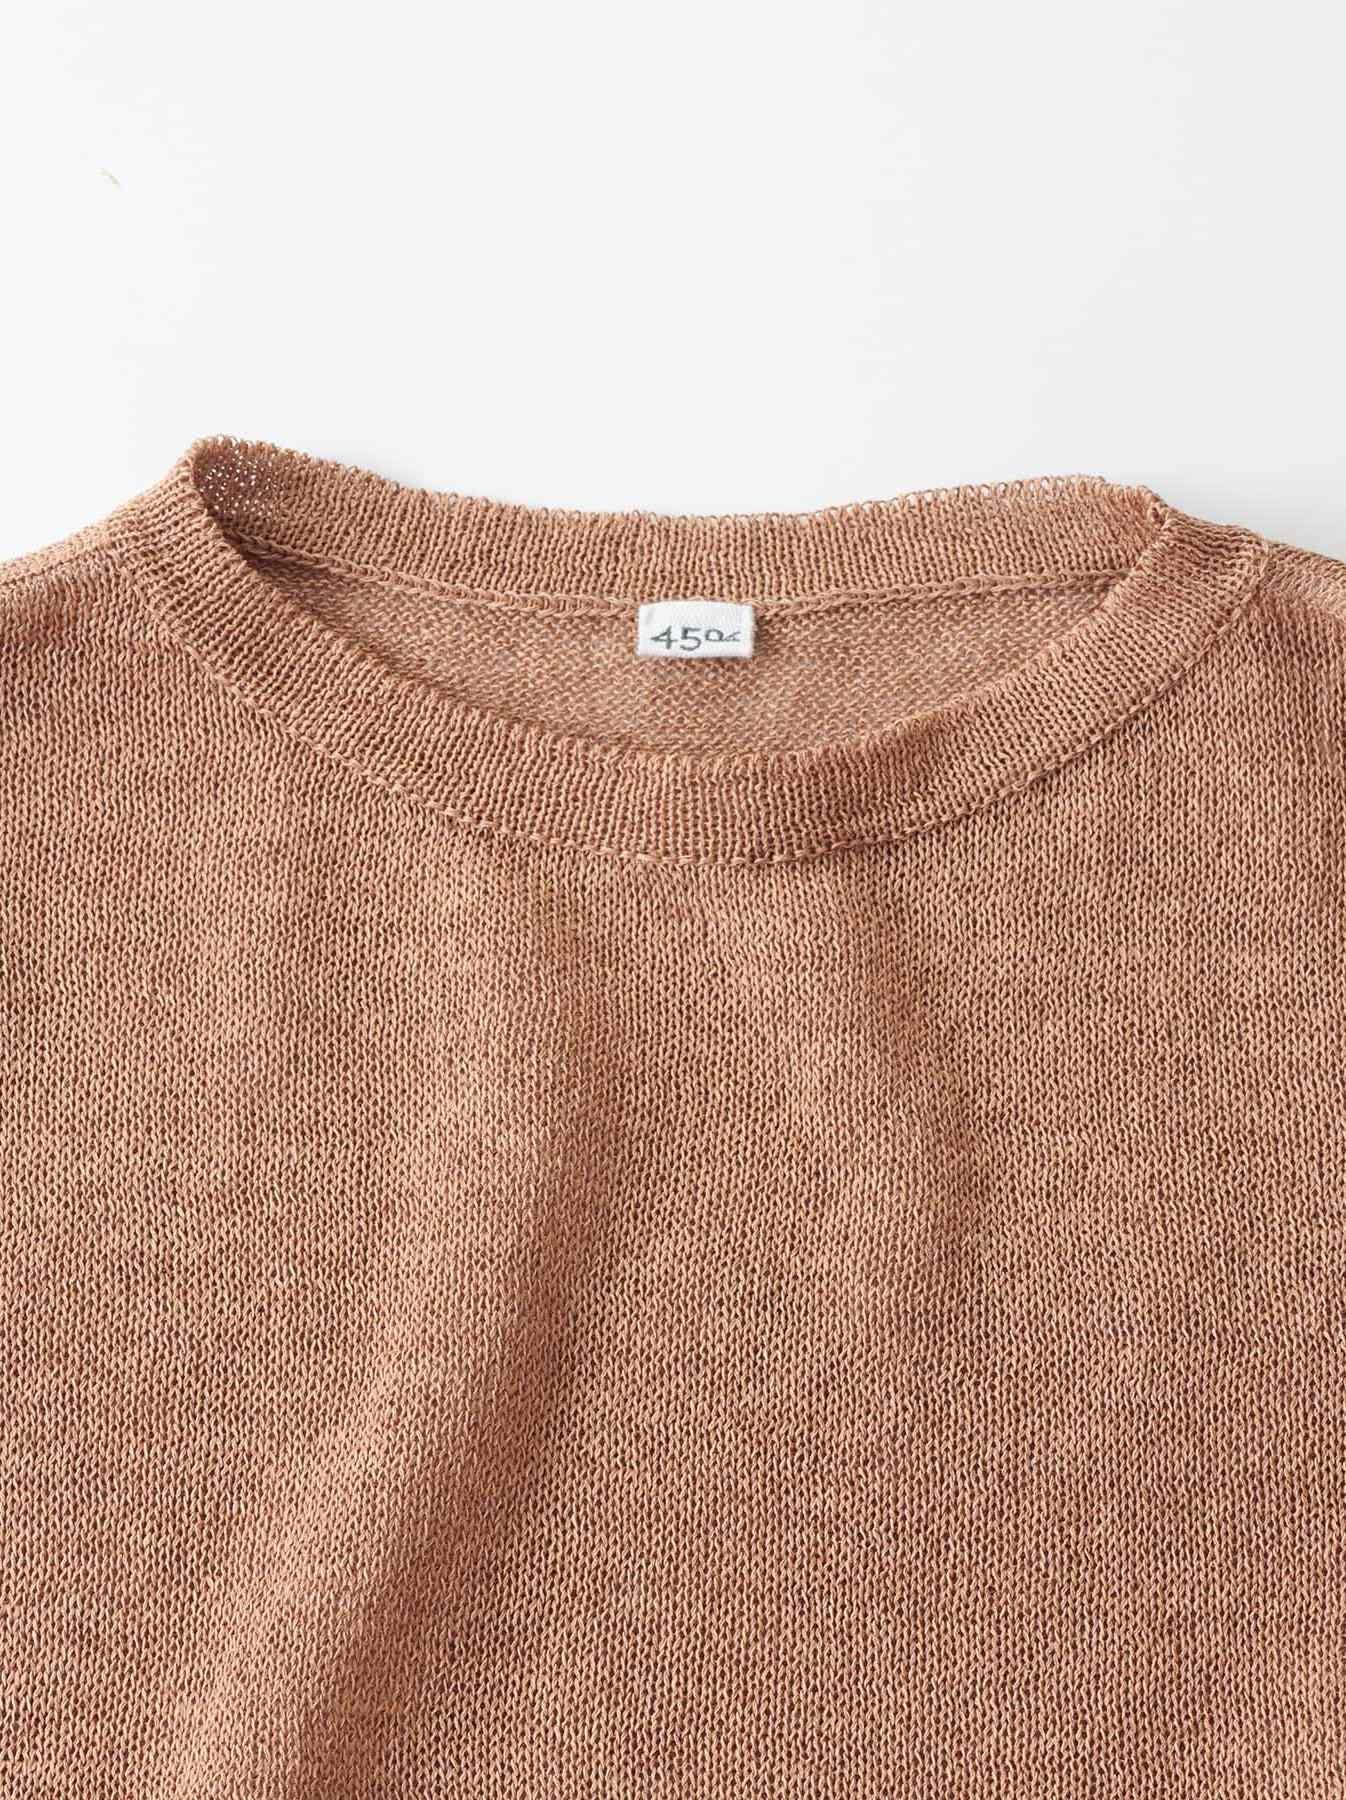 WH Gima Knit Long-sleeved T-shirt-7